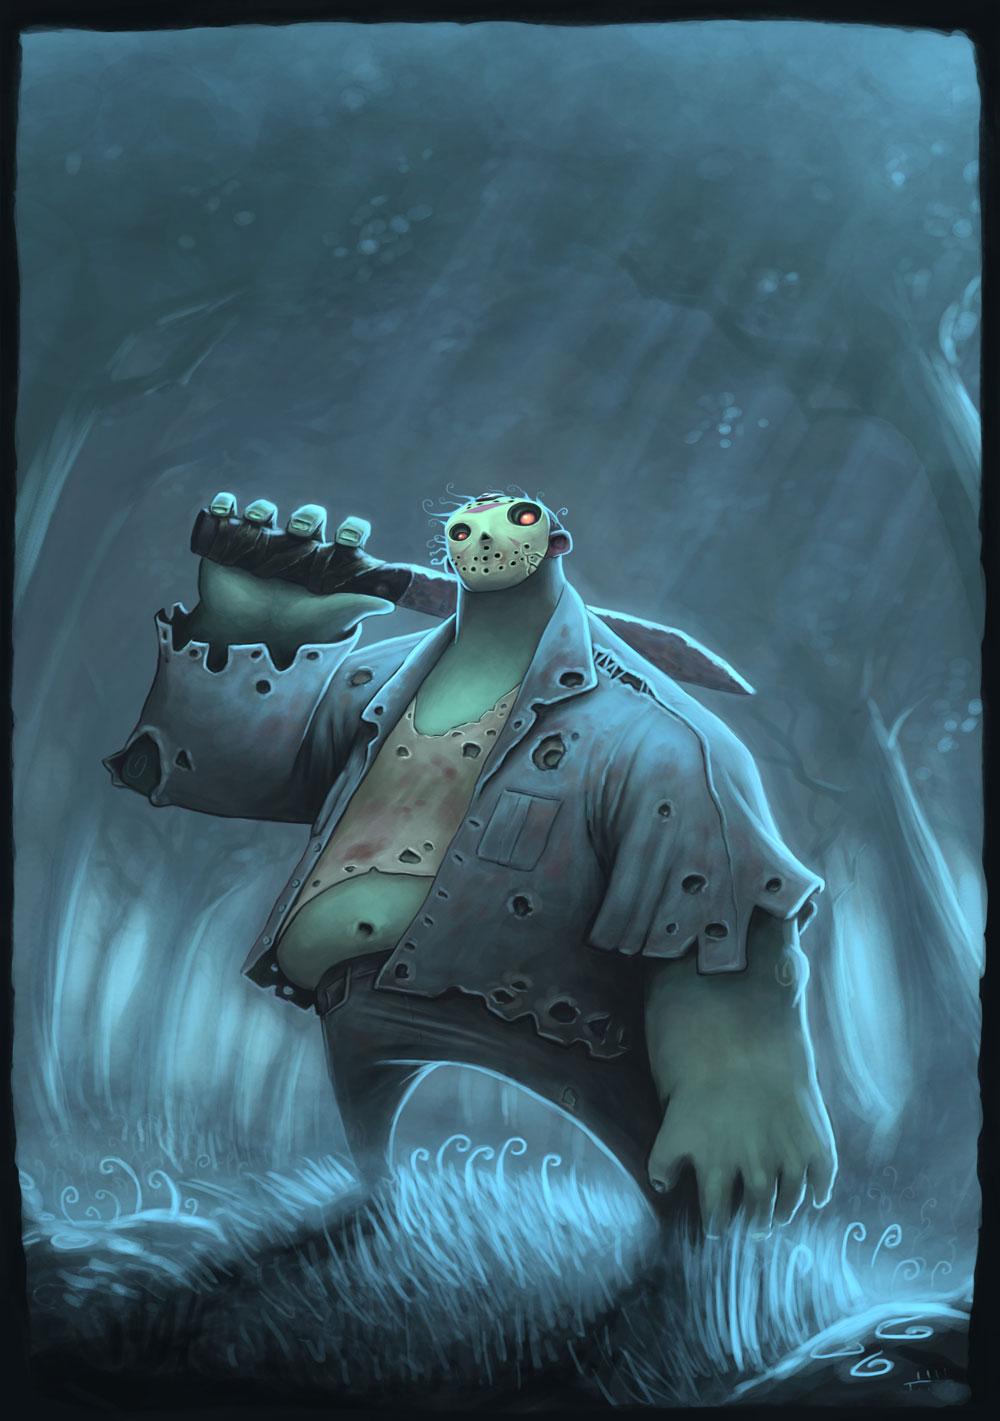 Fun Cartoon Style Series Of Classic Horror Movie Monster Art Geektyrant